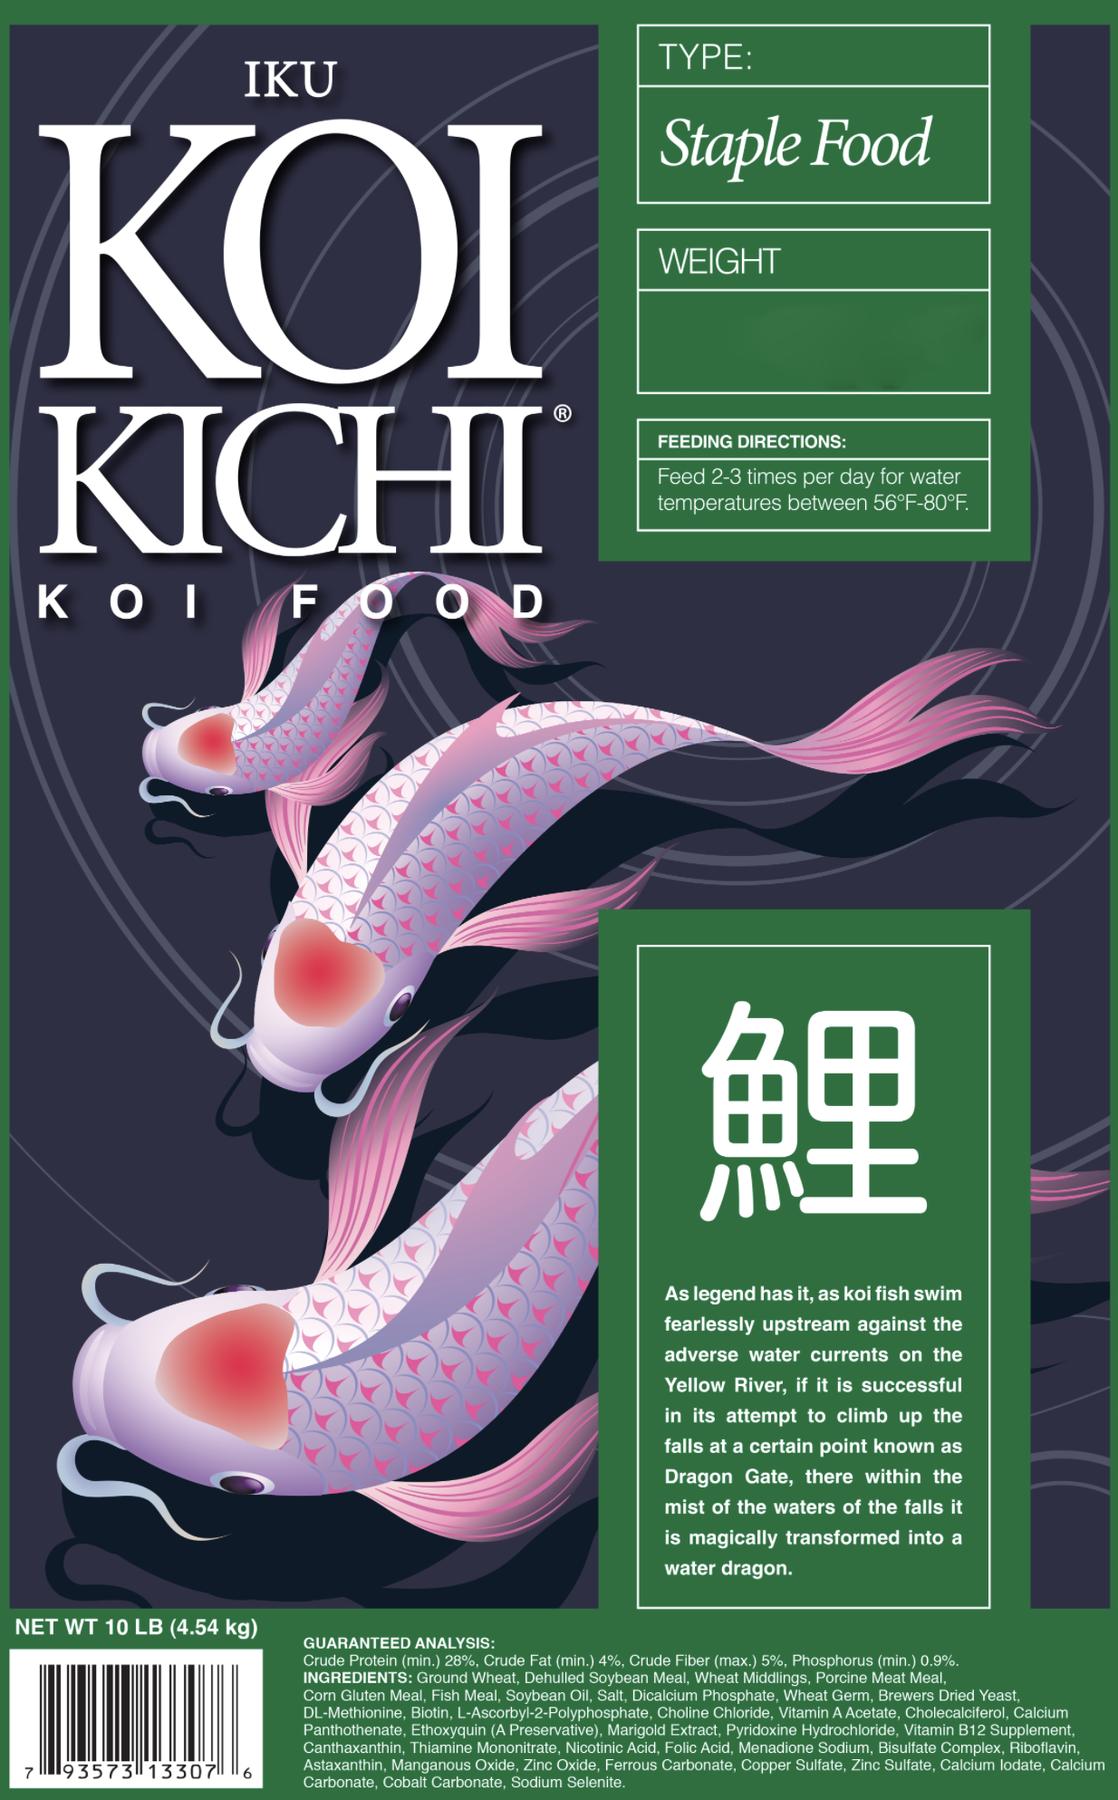 Iku Koi Kichi Staple Koi Fish Food - 2 lbs.